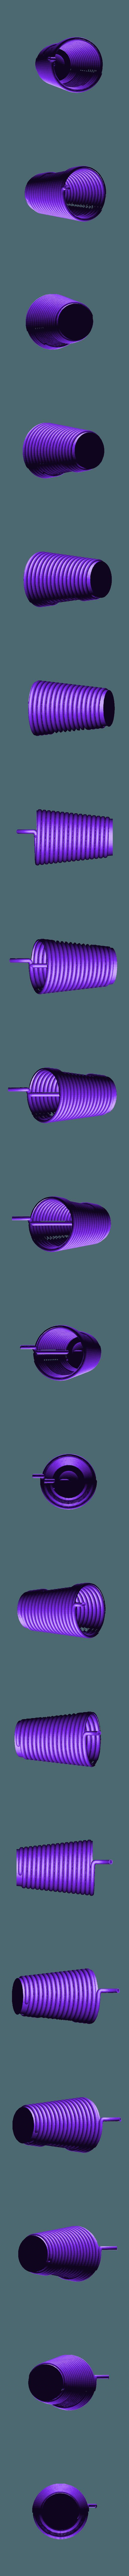 straw-glass-practical-v2-beta.stl Download free STL file Big StrawGlass - Practical • 3D print design, bLiTzJoN